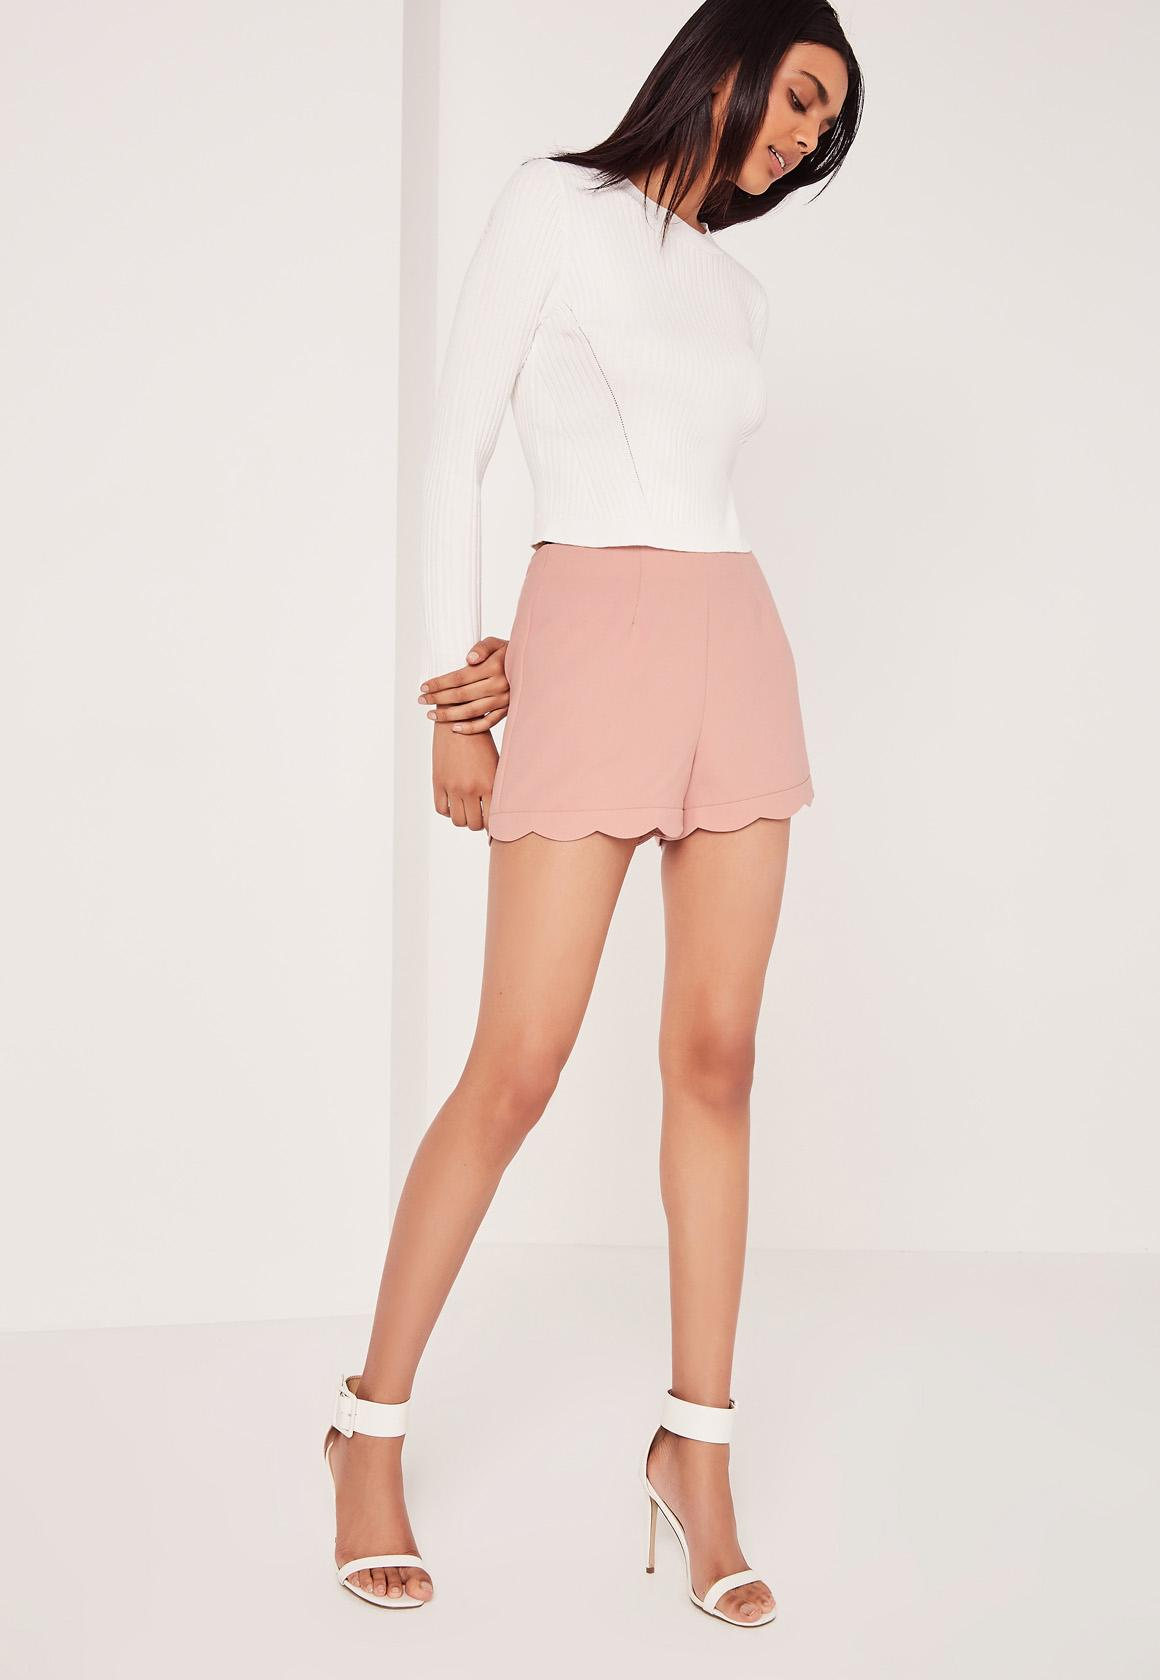 Scallop Hem High Waisted Shorts Blush Pink   Missguided